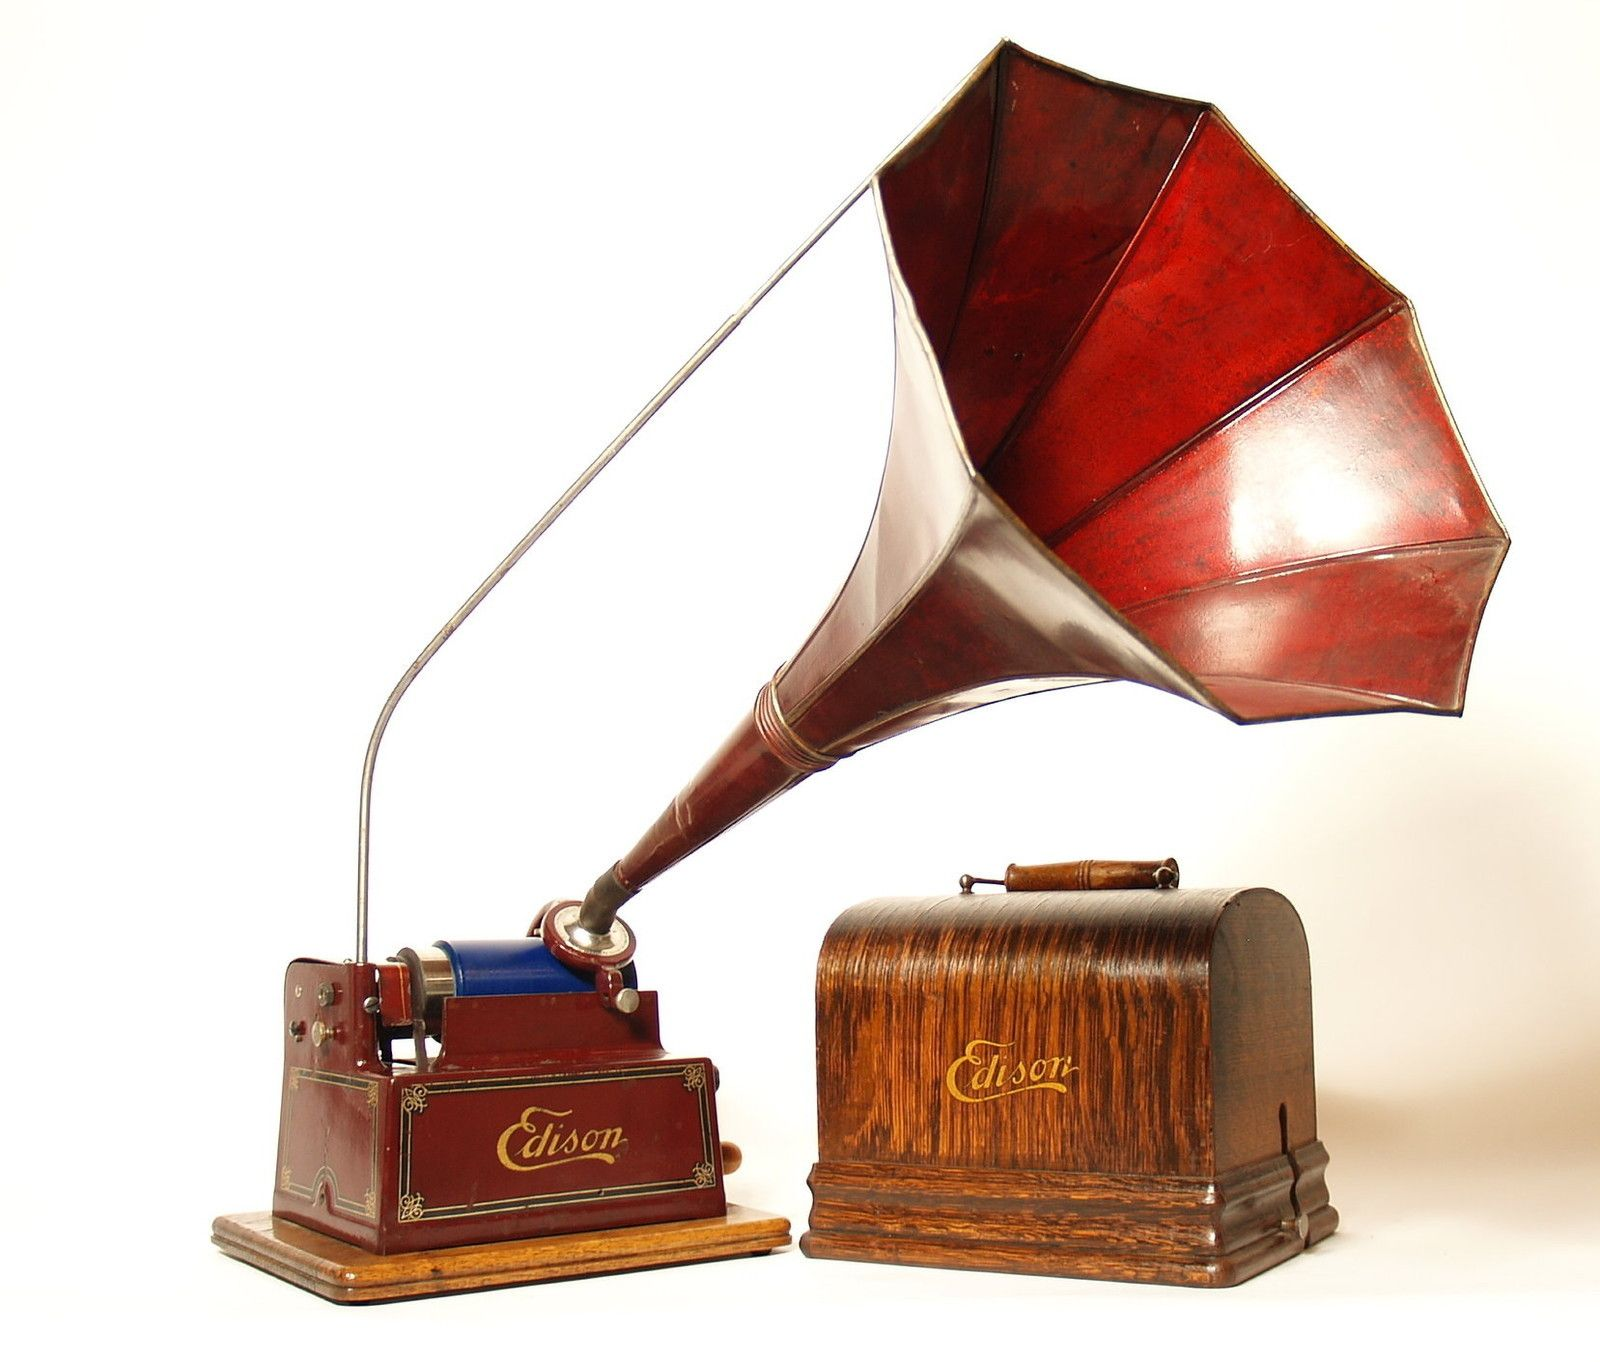 1909 Edison Phonograph | GreatestCollectibles.com | Making Music ... for Thomas Edison Phonograph Cylinder  35fsj